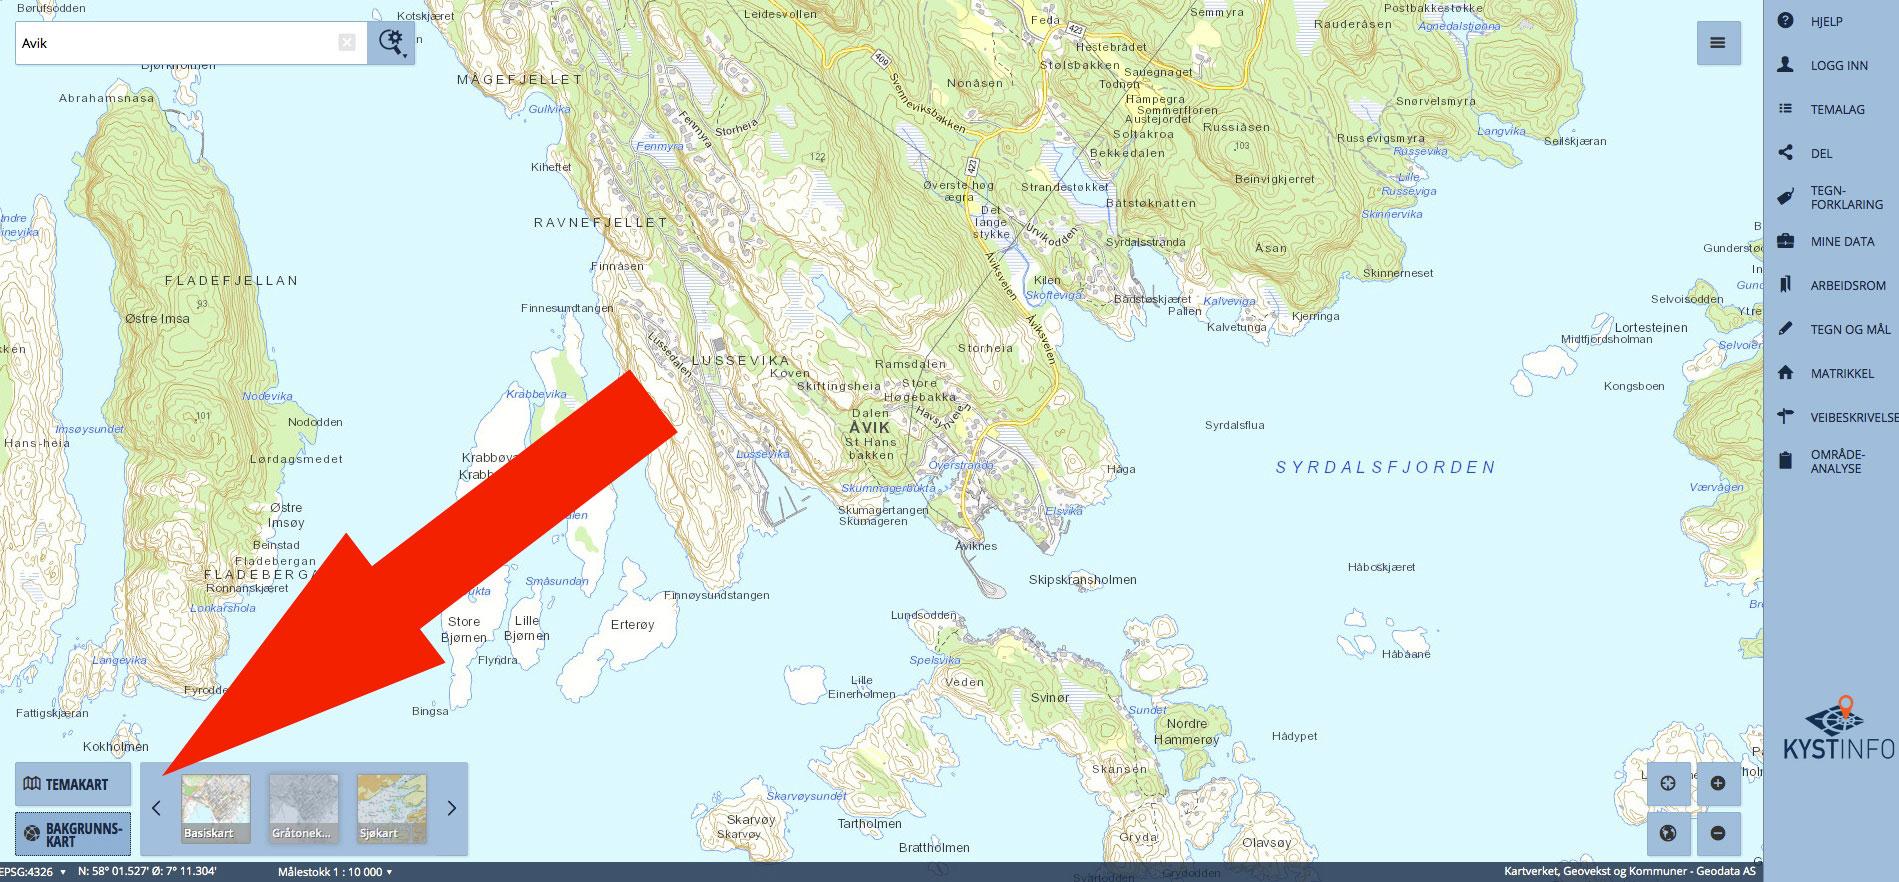 Seekarte Norwegen Kostenlos In 5 Schritten Erstellen Blinker